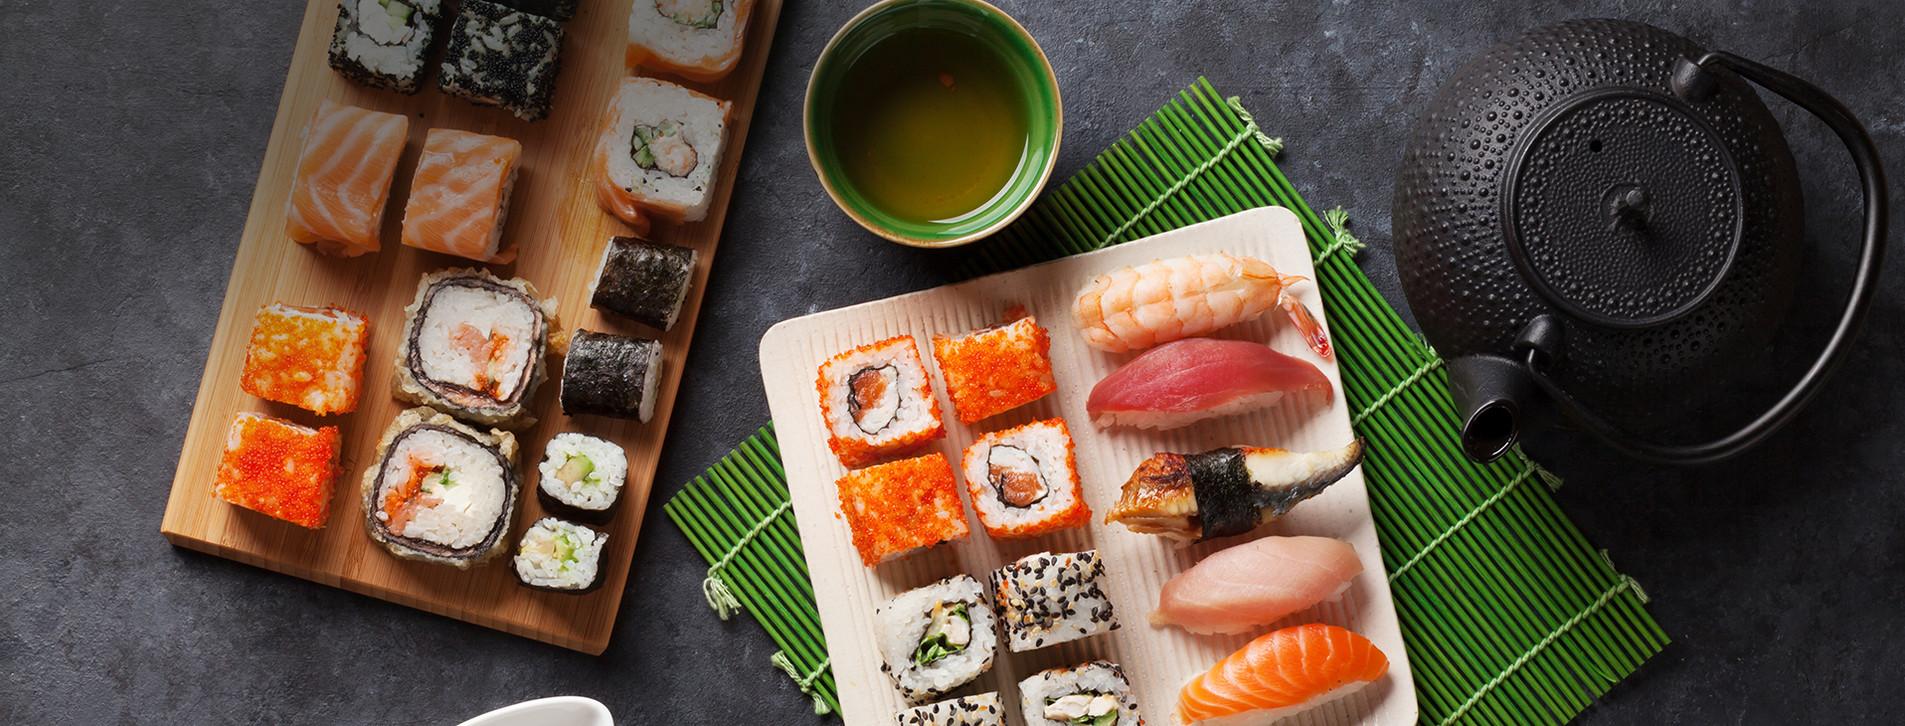 Фото 1 - Мастер-класс суши для двоих